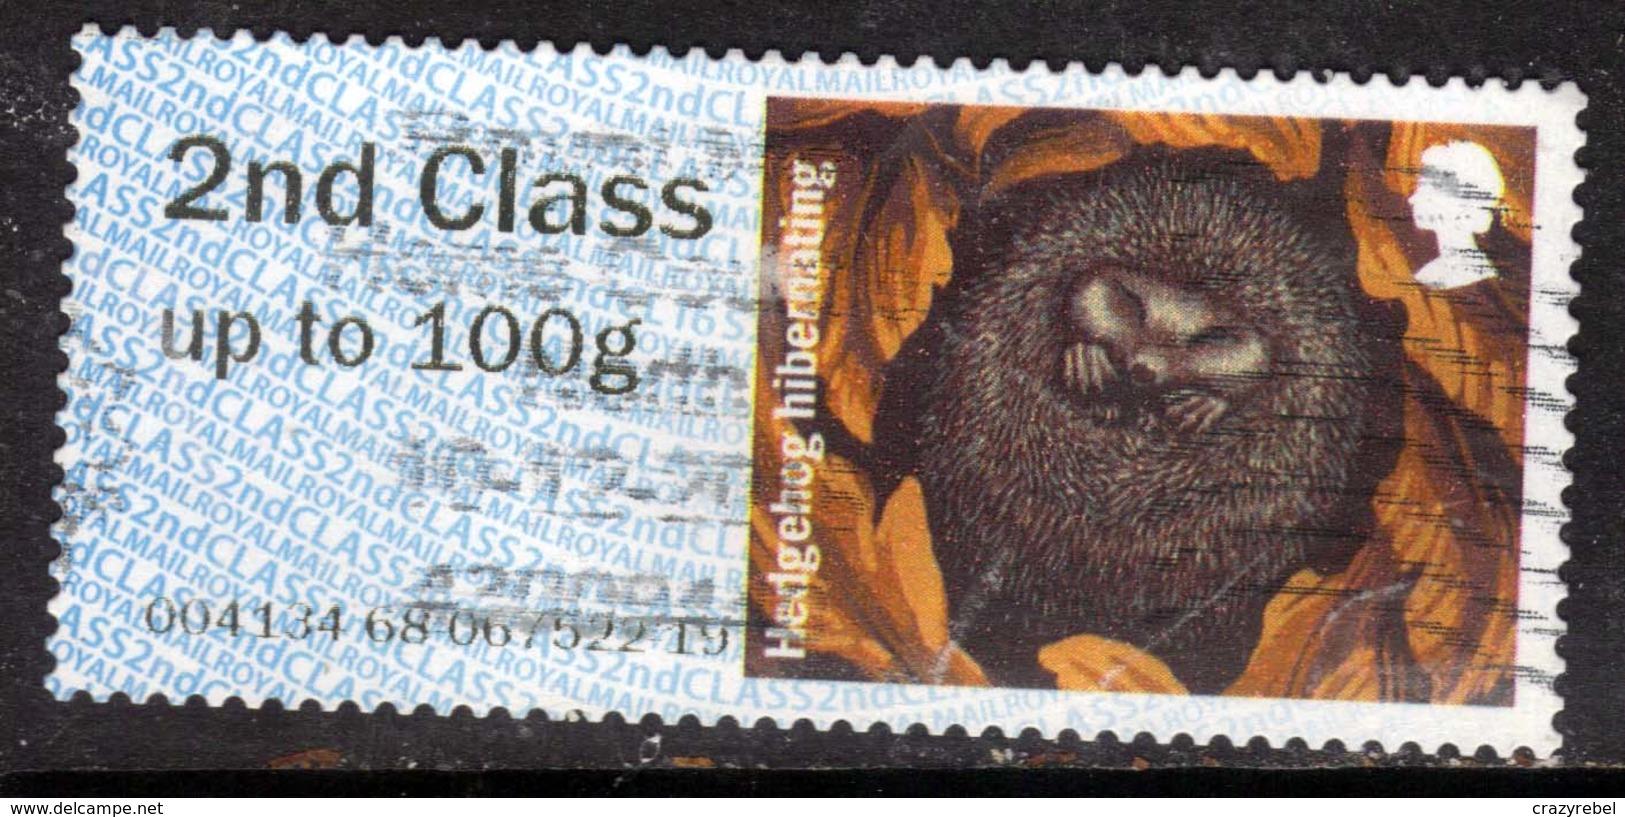 GB 2016 QE2 2nd To 100gms Post & Go Hibenating Hedgehog ( F1408 ) - Great Britain